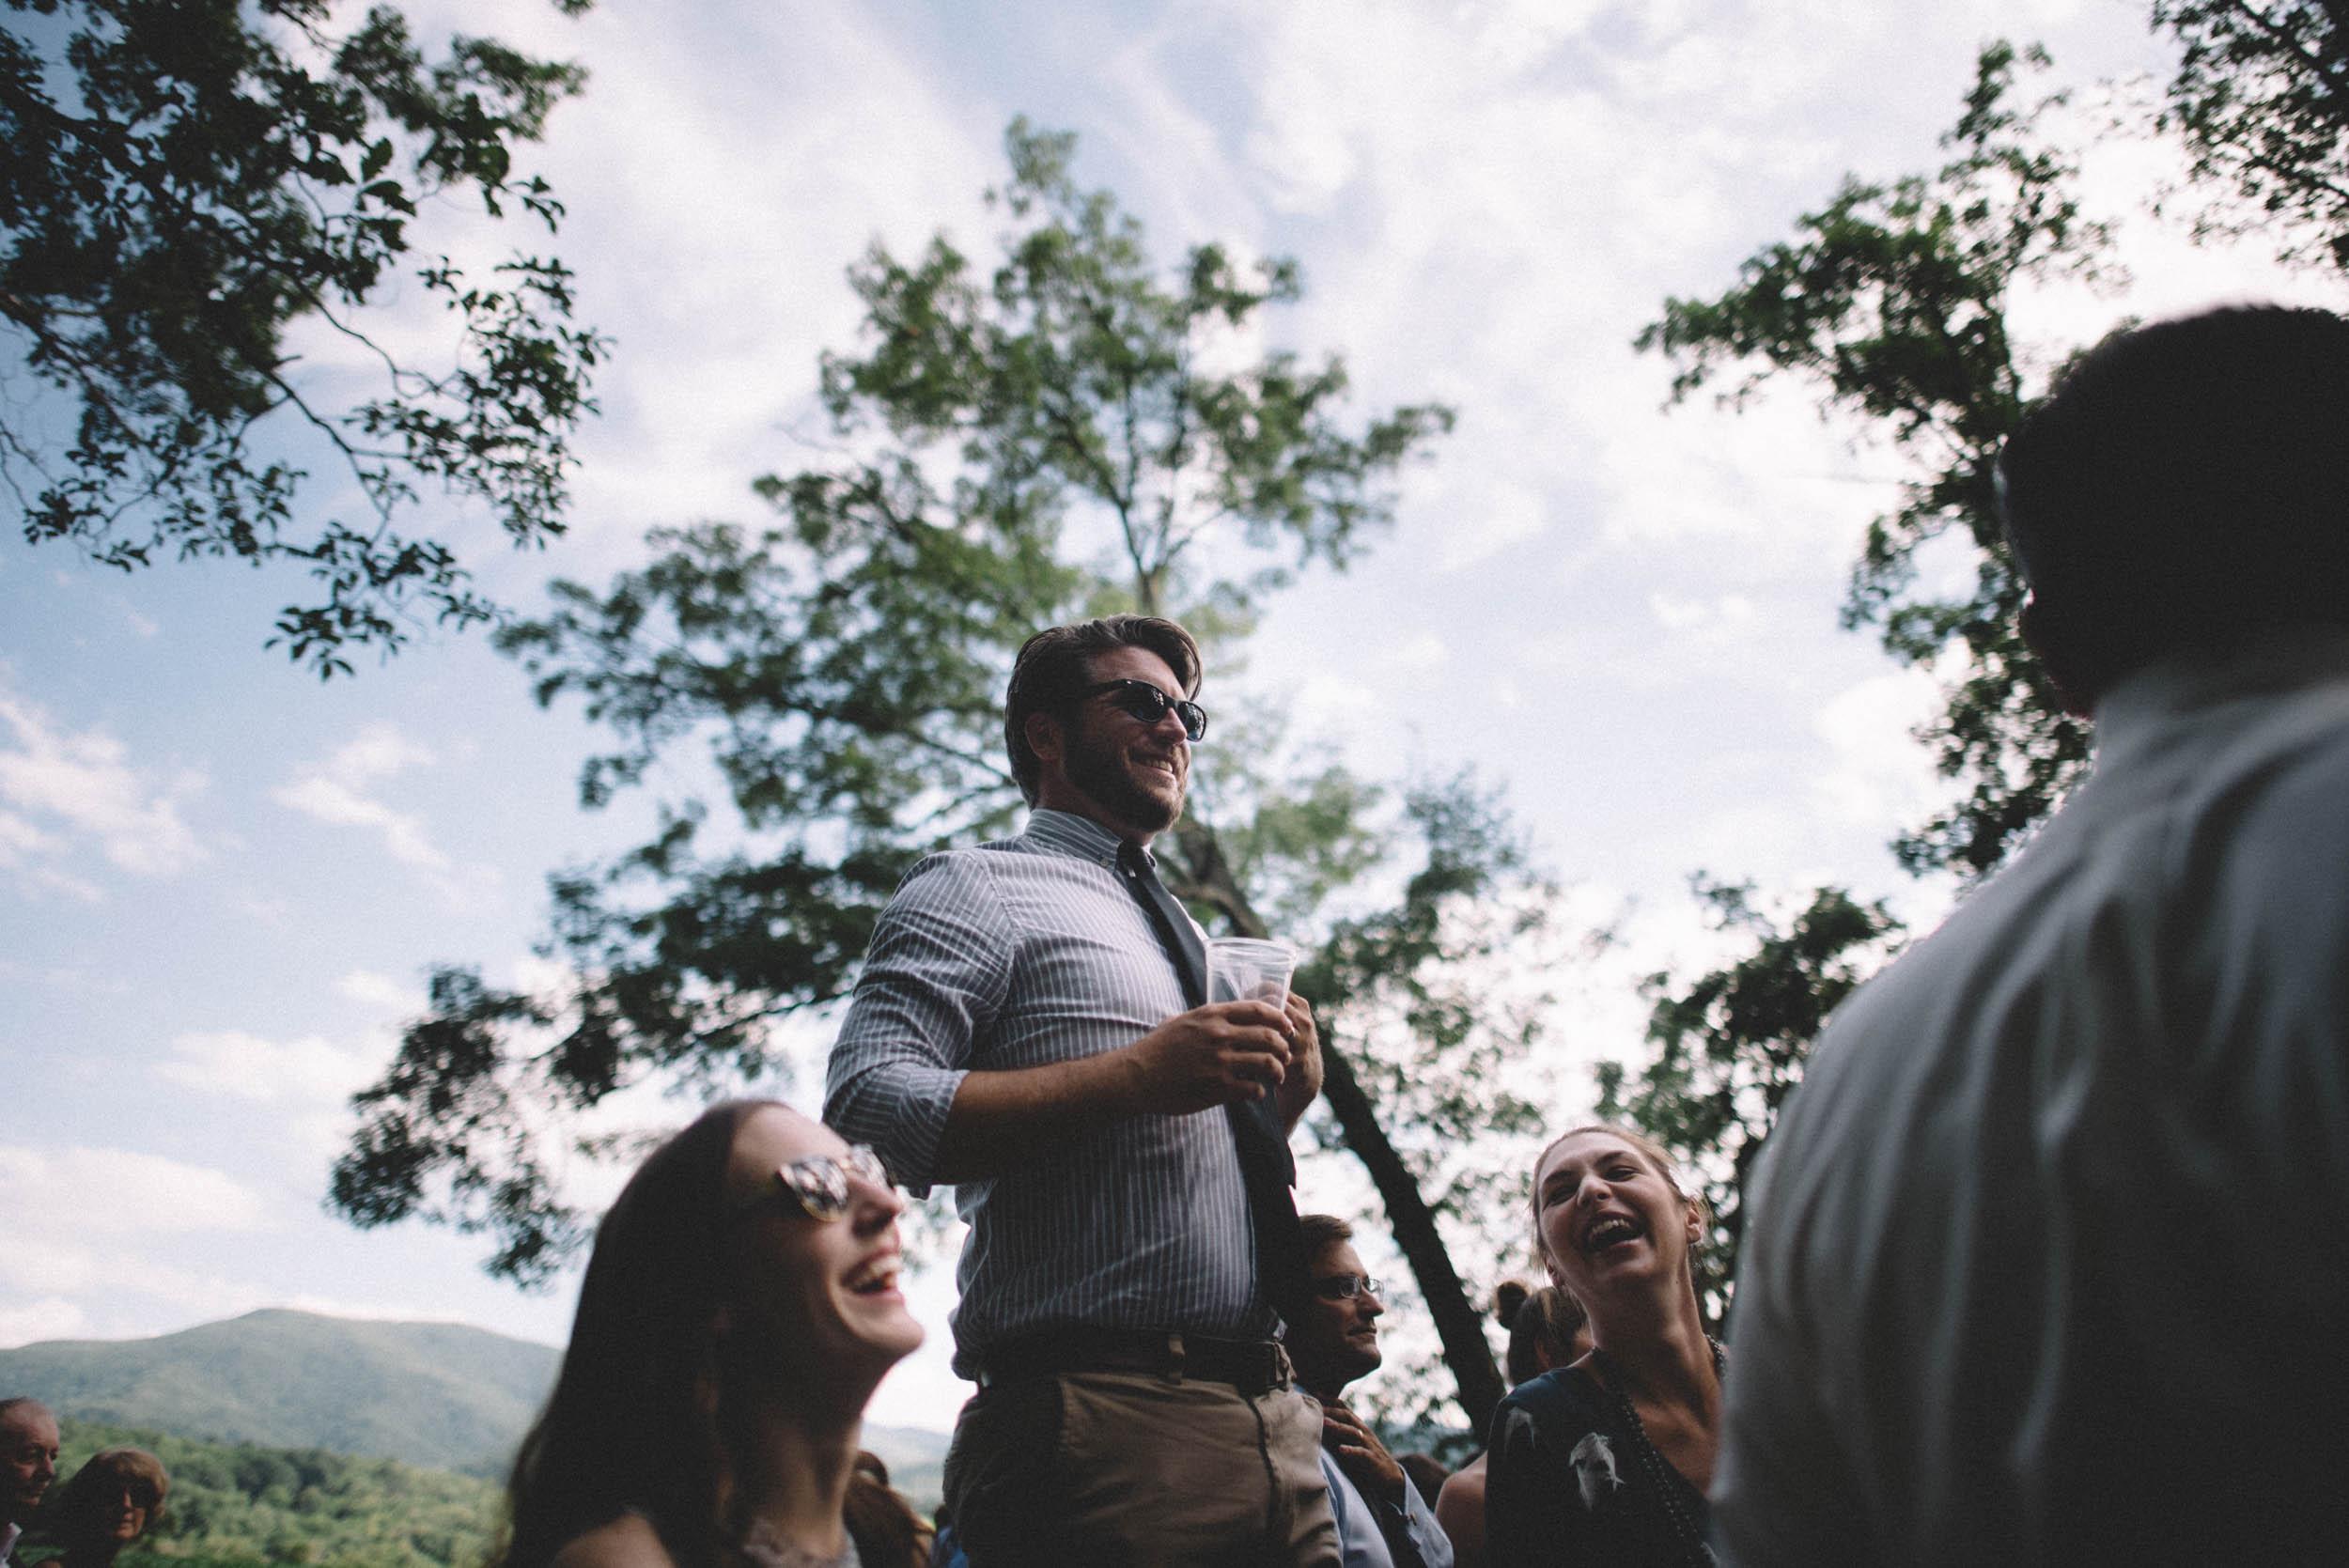 Wedding ceremony in Stanley, Virginia